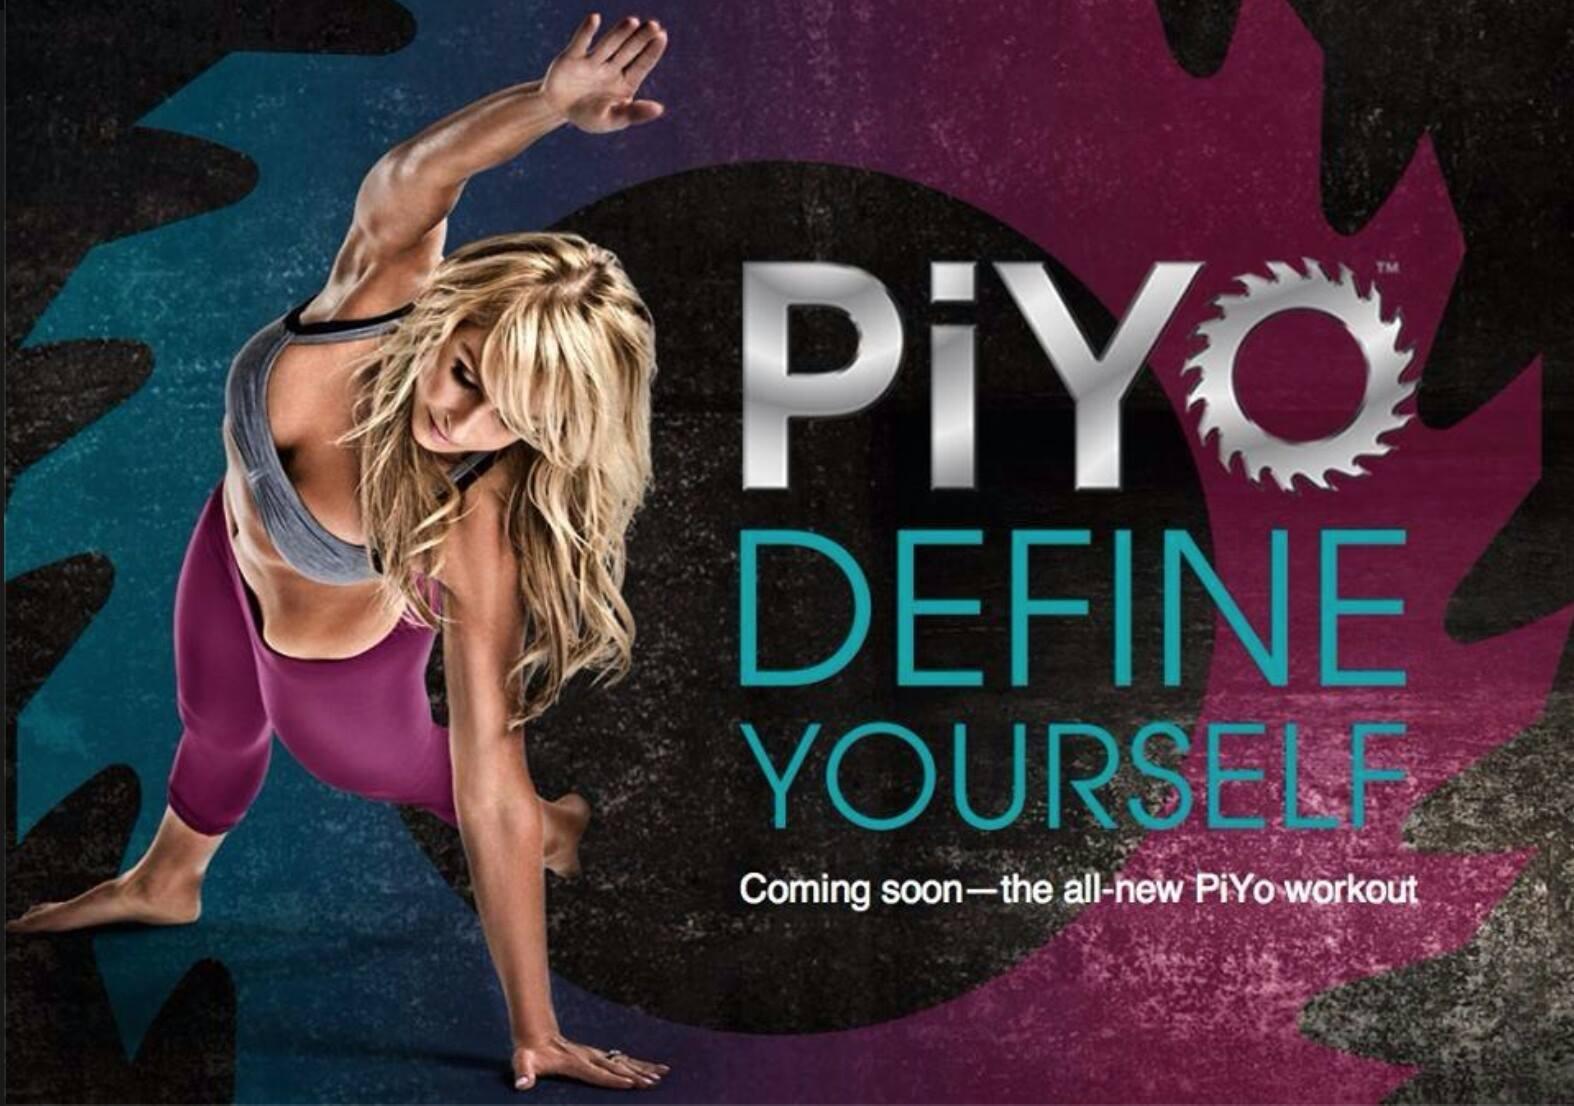 New PiYo Workout